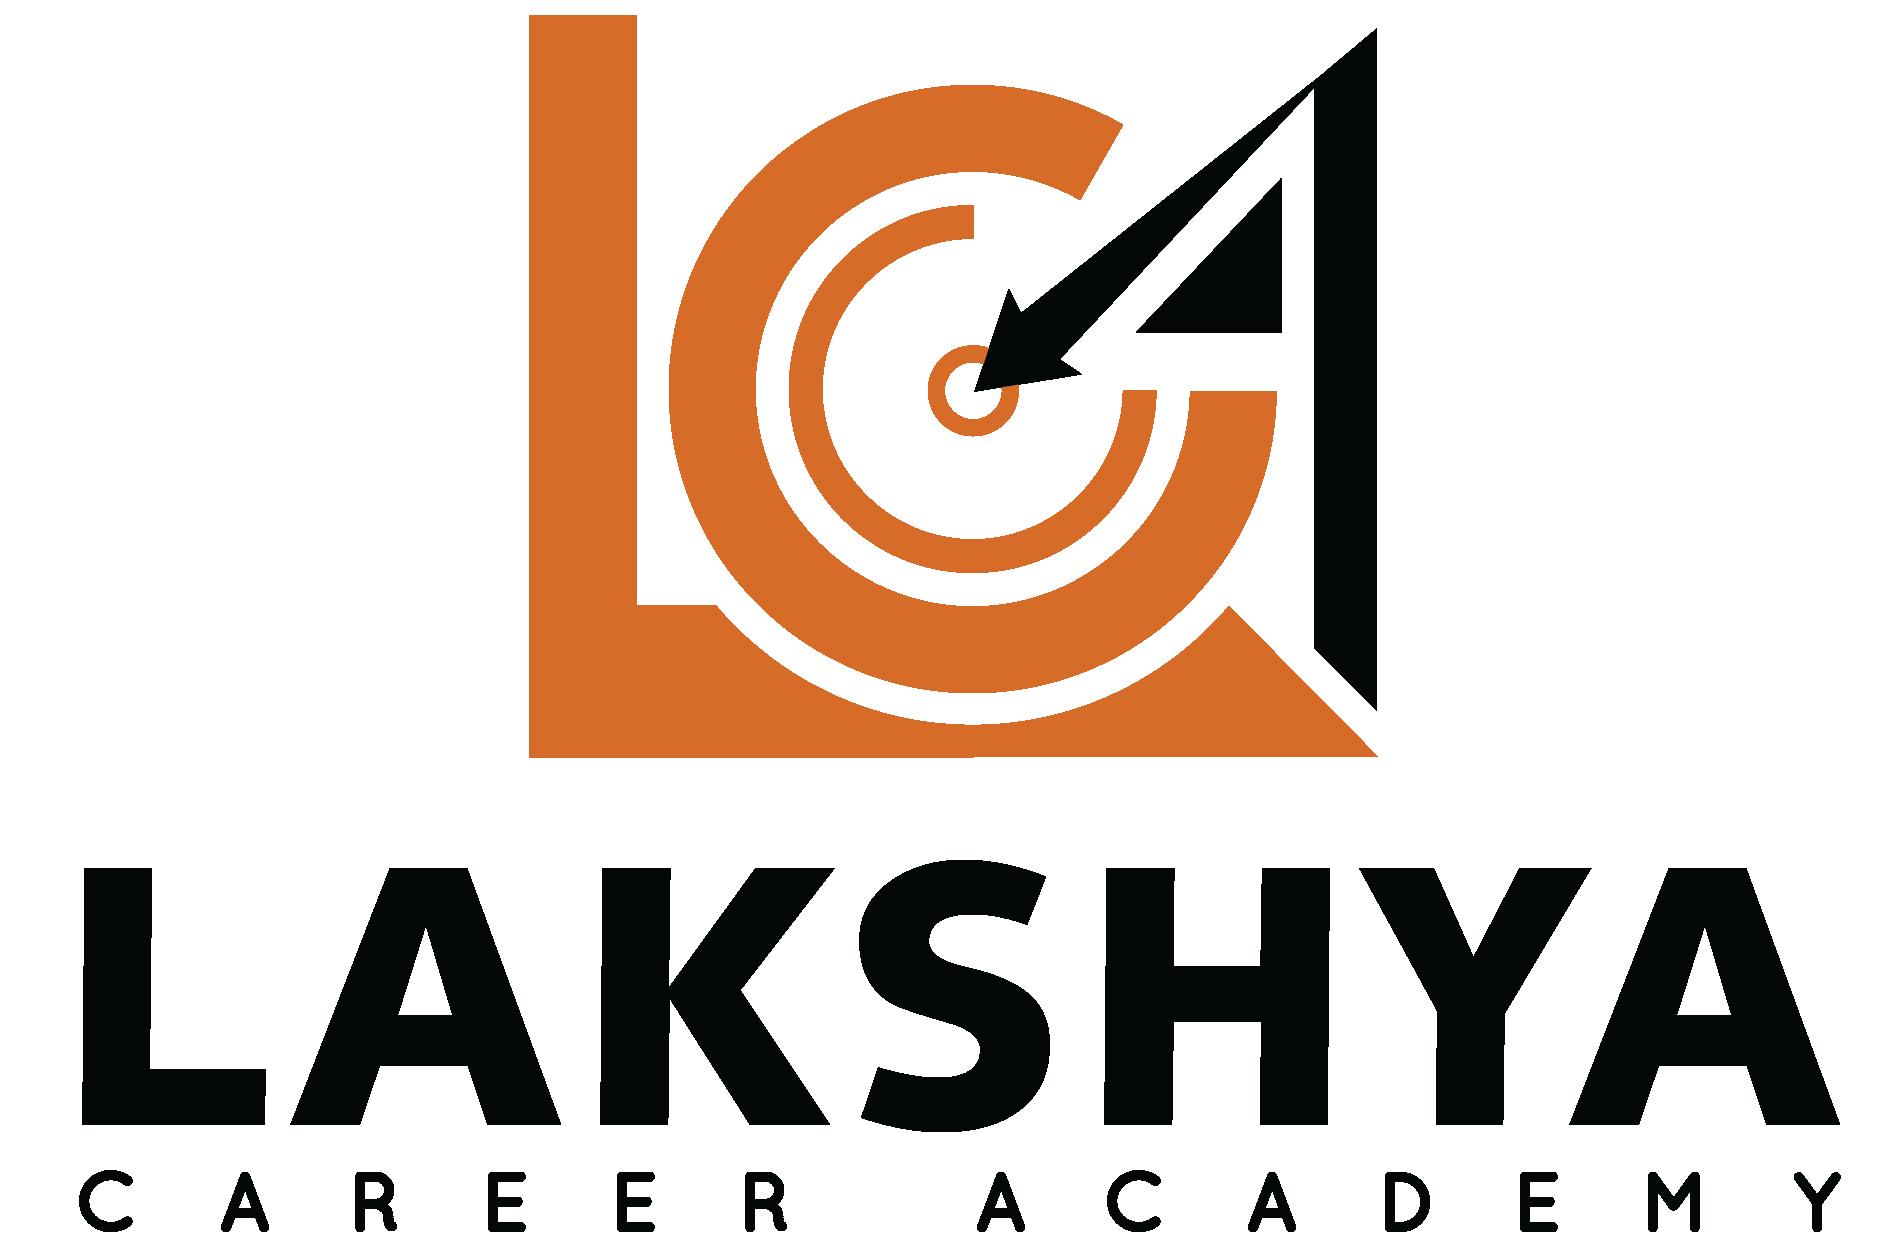 Lakshya Career Academy